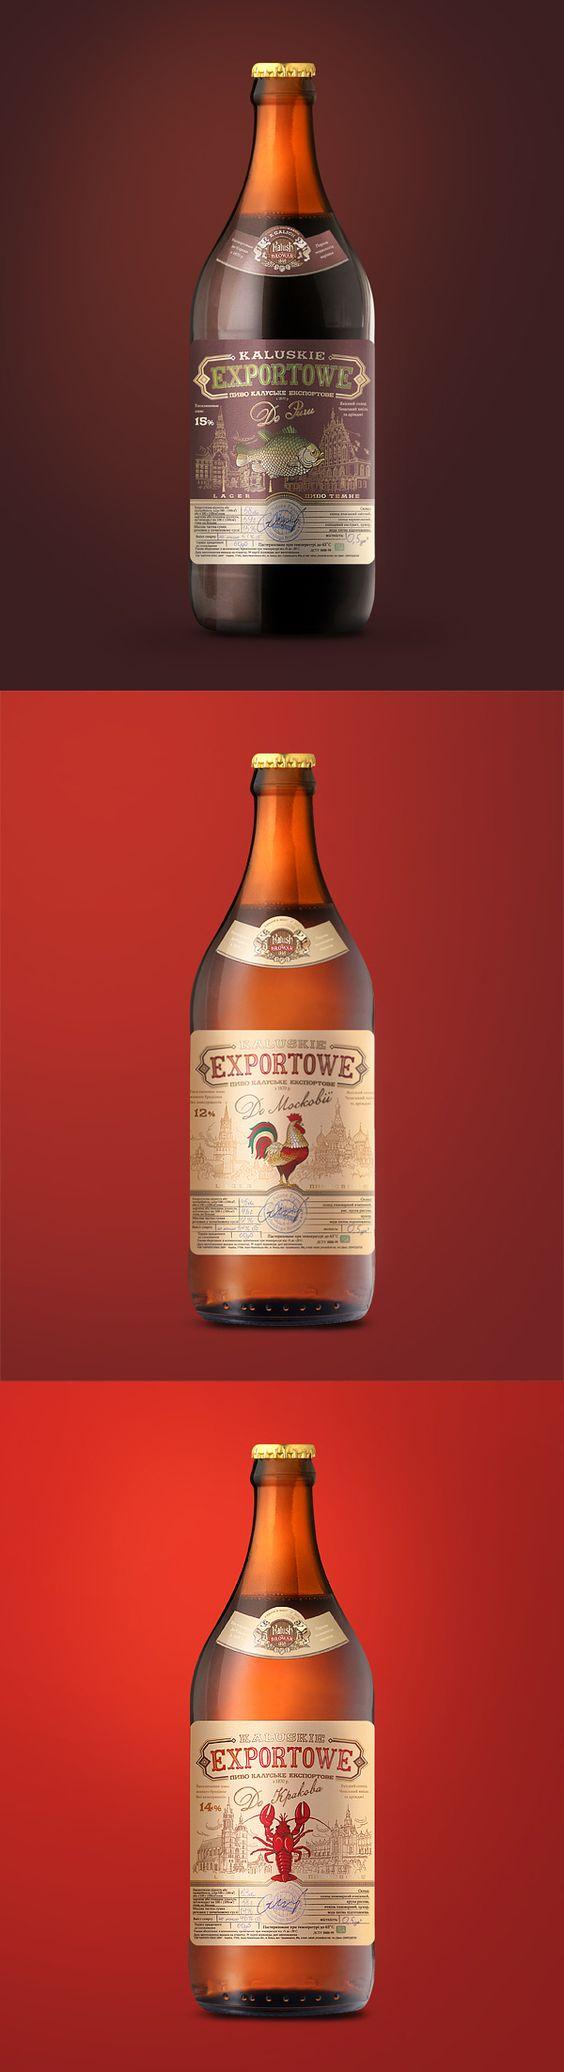 Beer label designs by Yaroslav Shkriblyak, via Behance